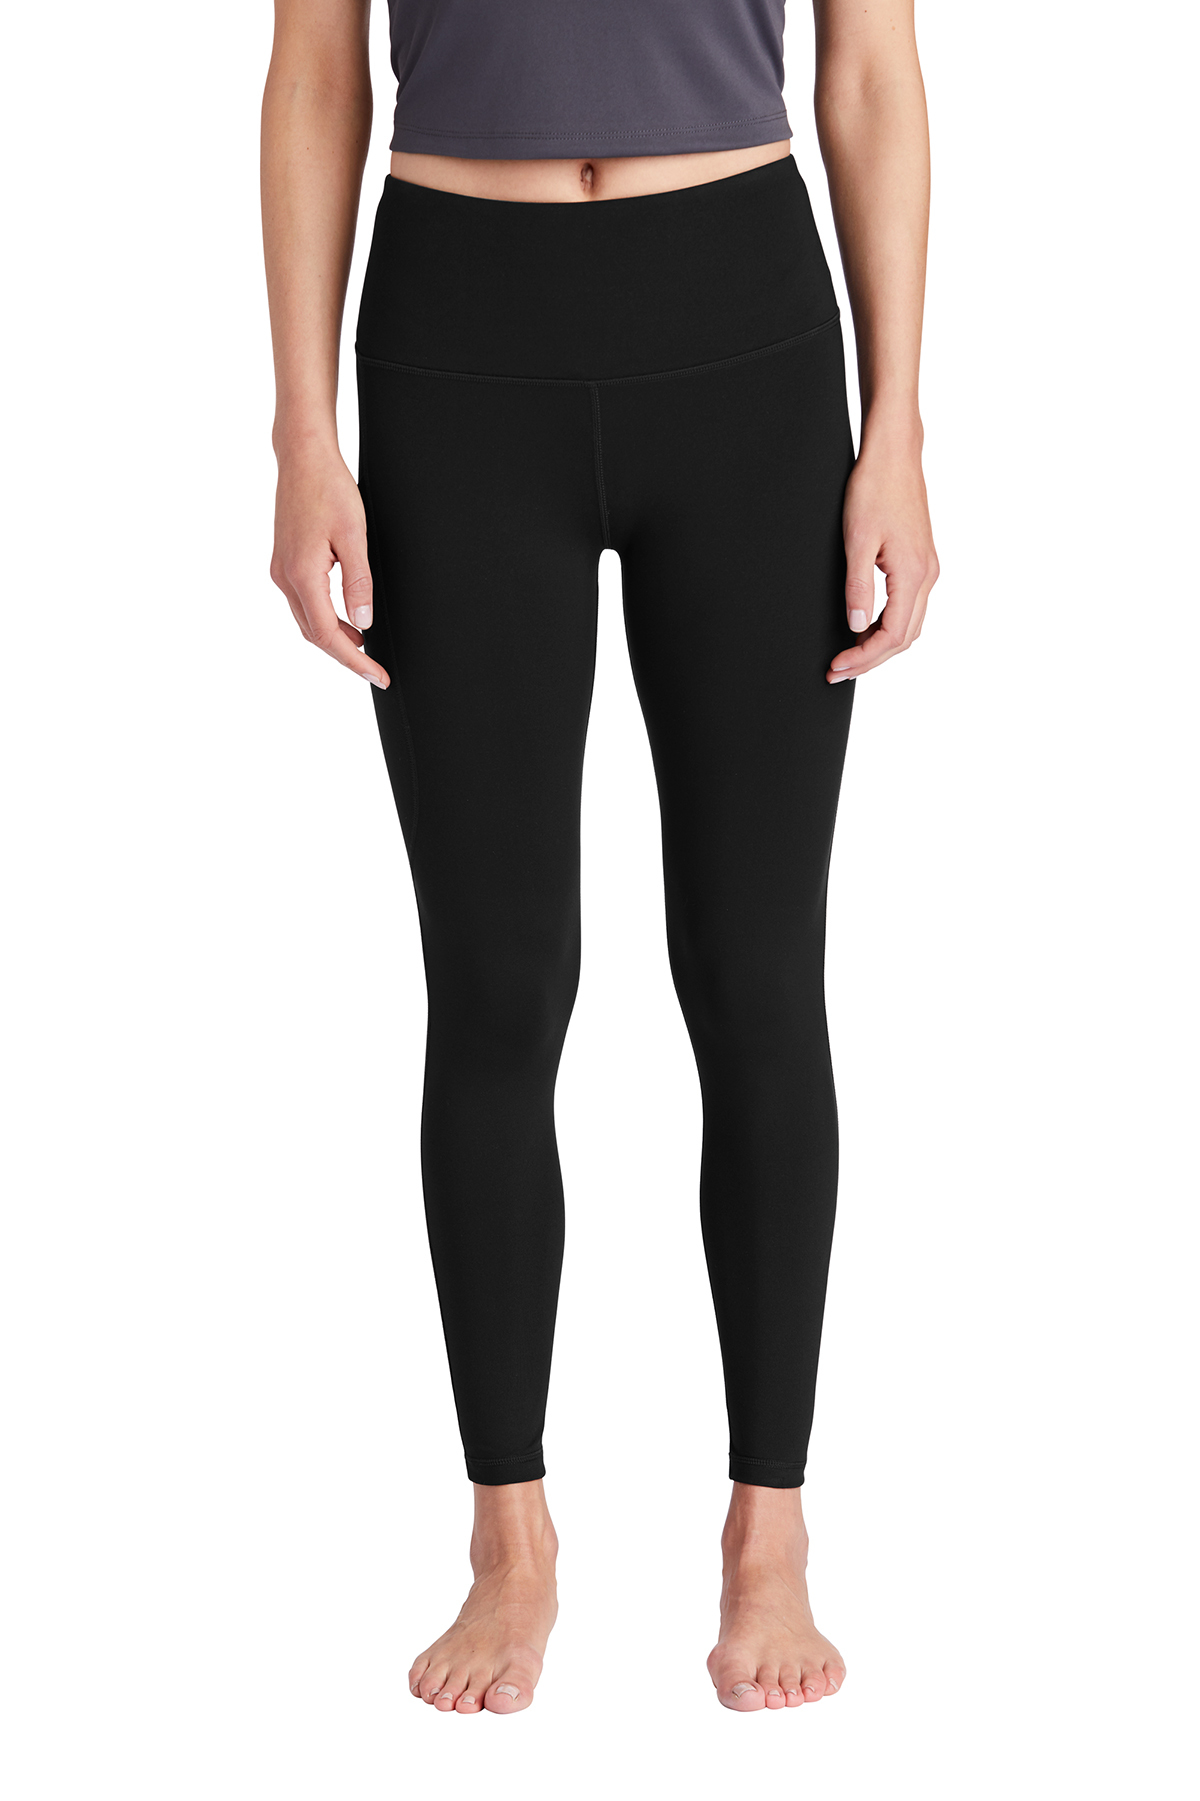 Sport-Tek LPST891 - Ladies High Rise 7/8 Legging